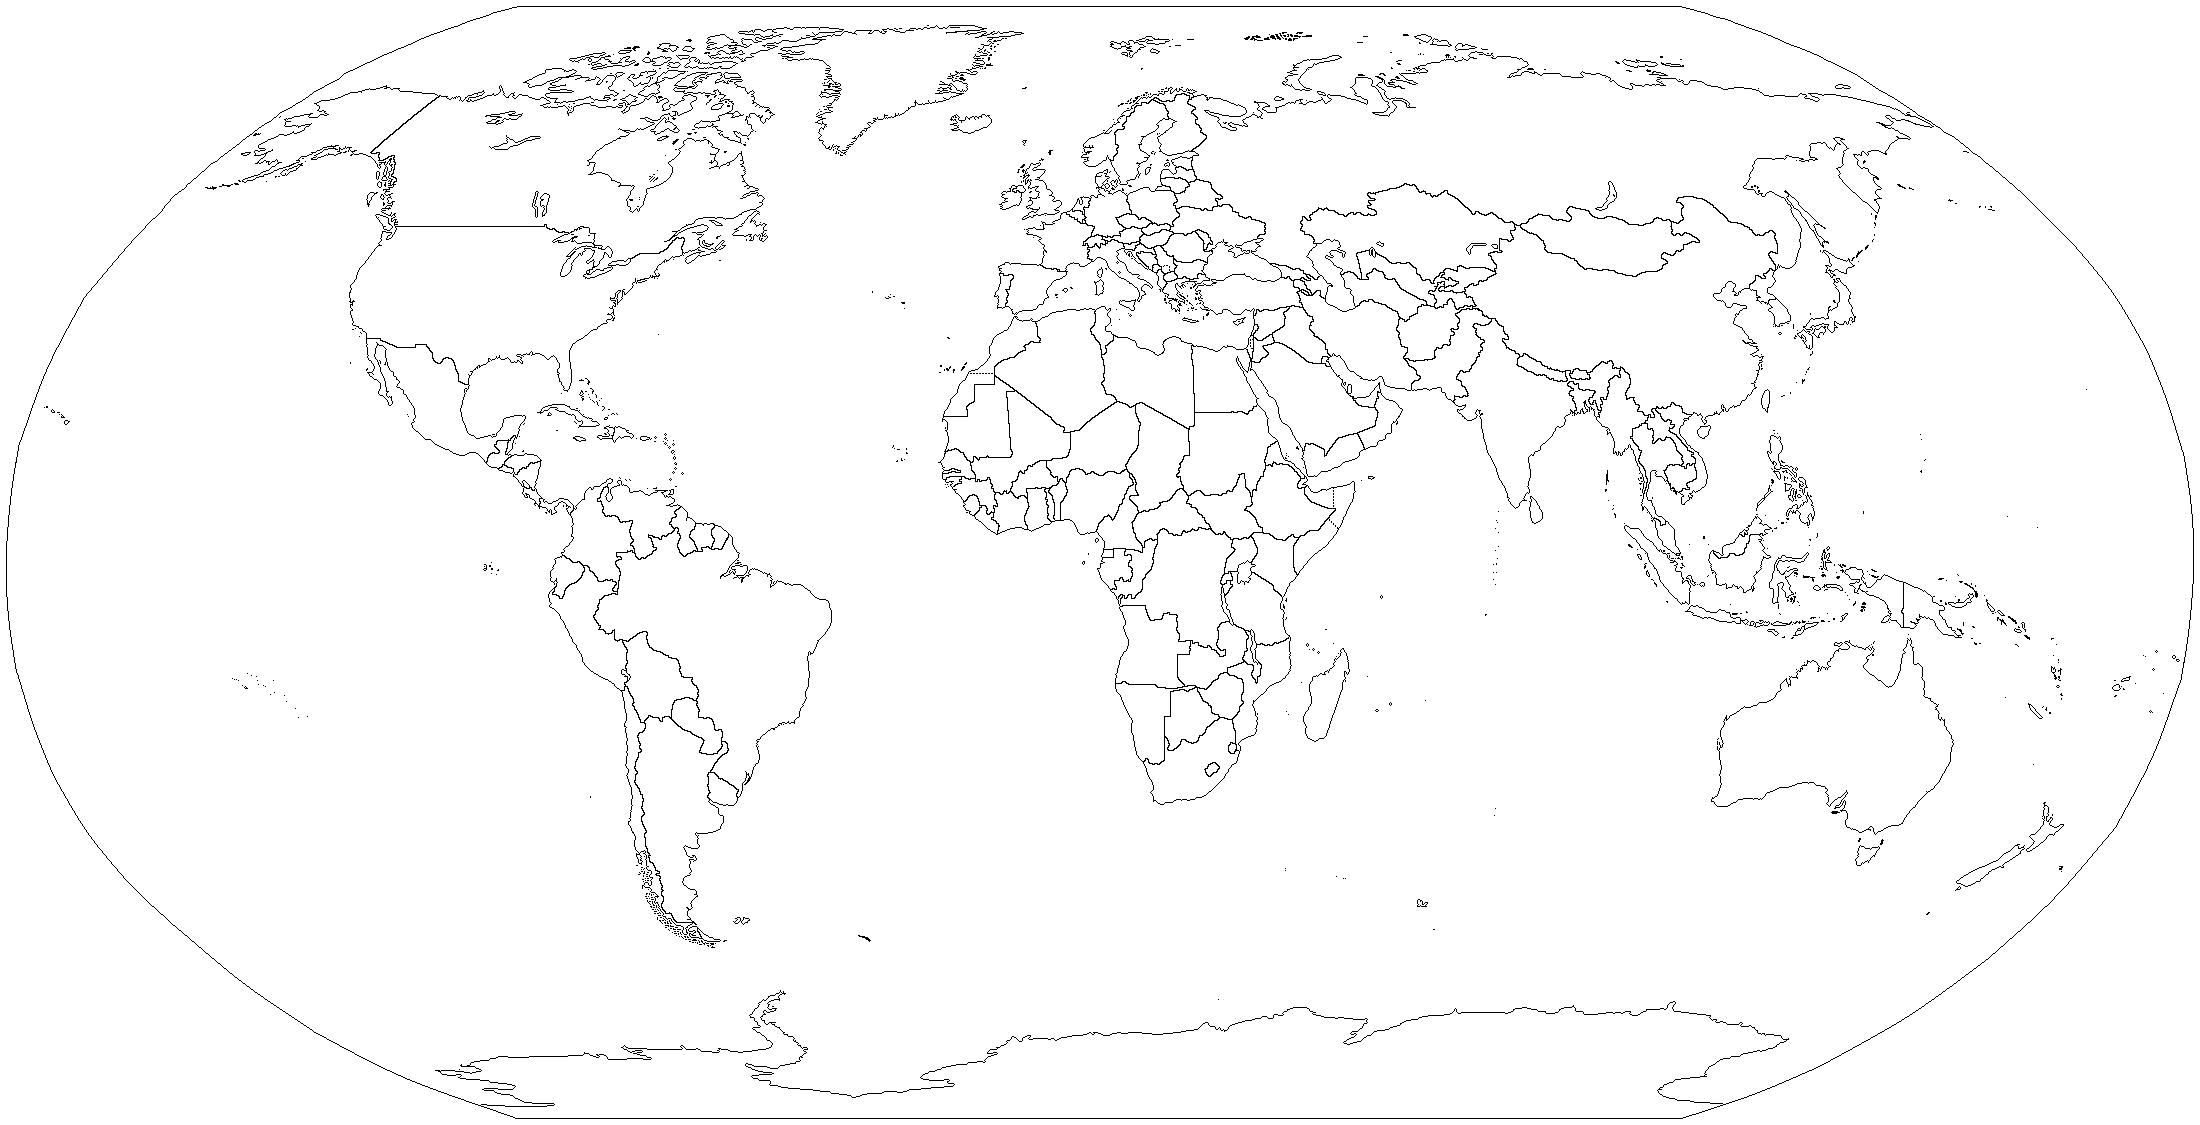 carte du monde vierge bac File:Monde (fond de carte).png   Wikimedia Commons